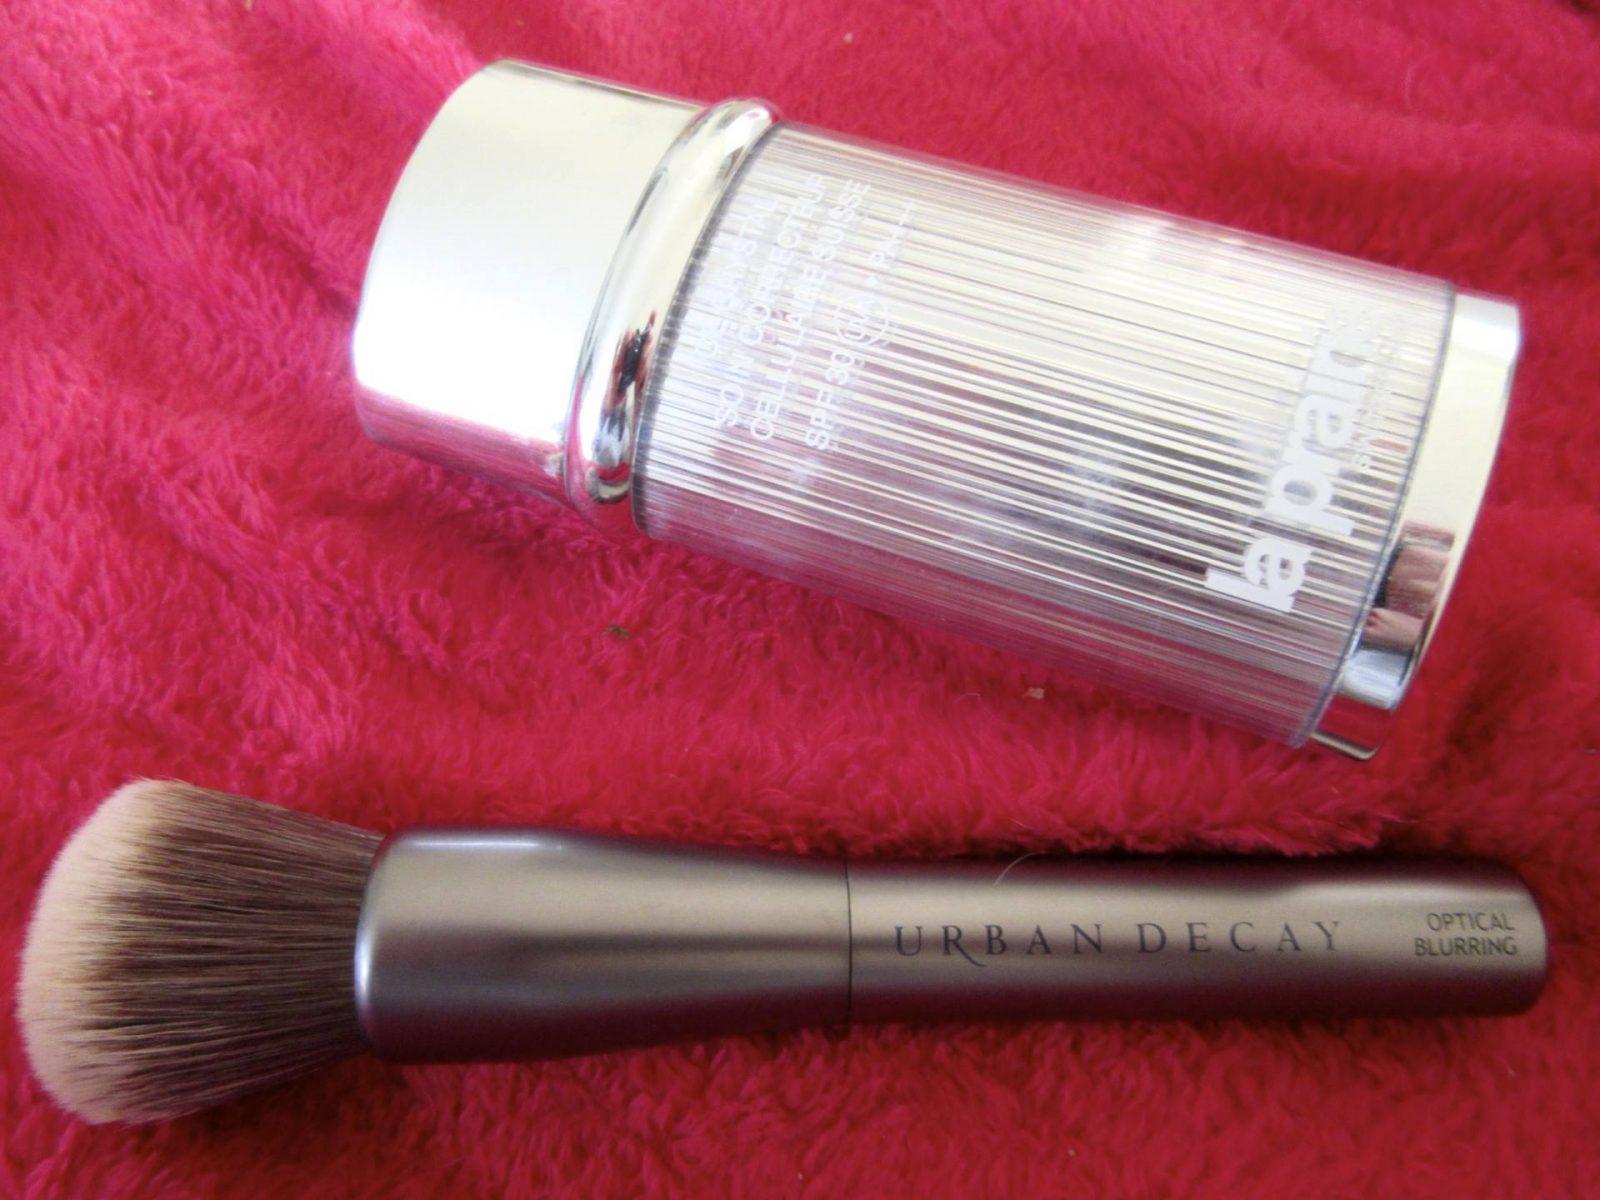 beauty review: my la prairie skincare regimen;